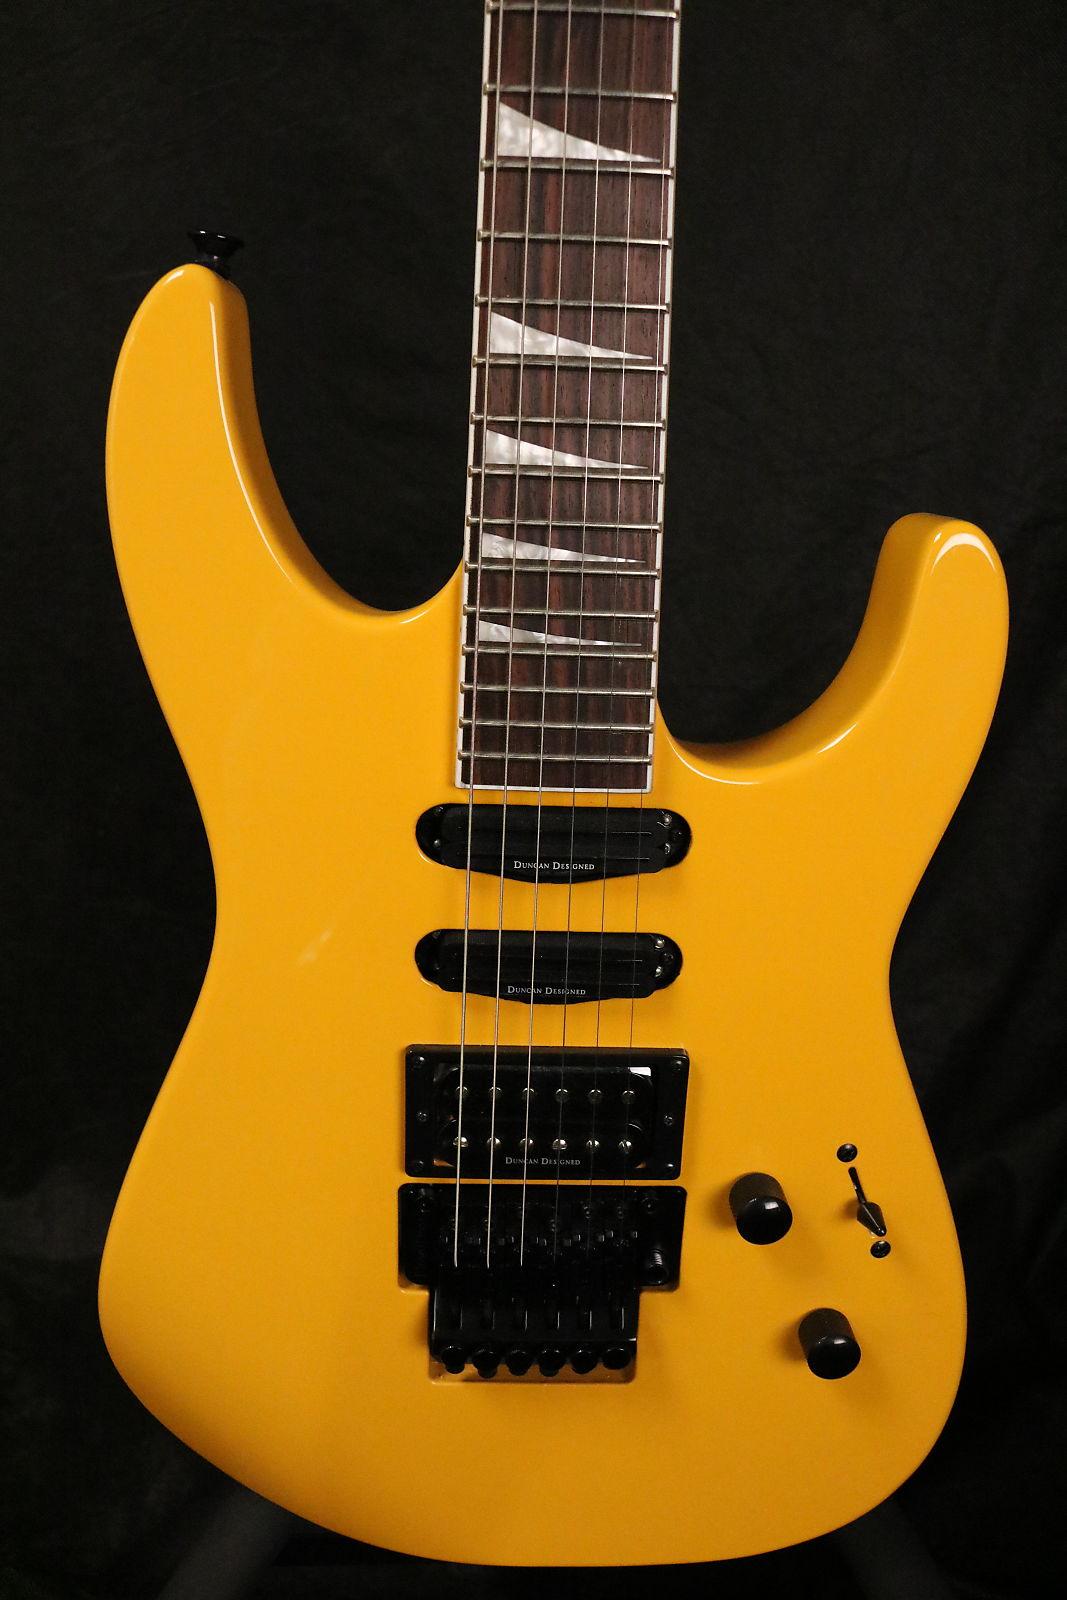 Jackson X Series Soloist SL3X Taxi Cab Yellow